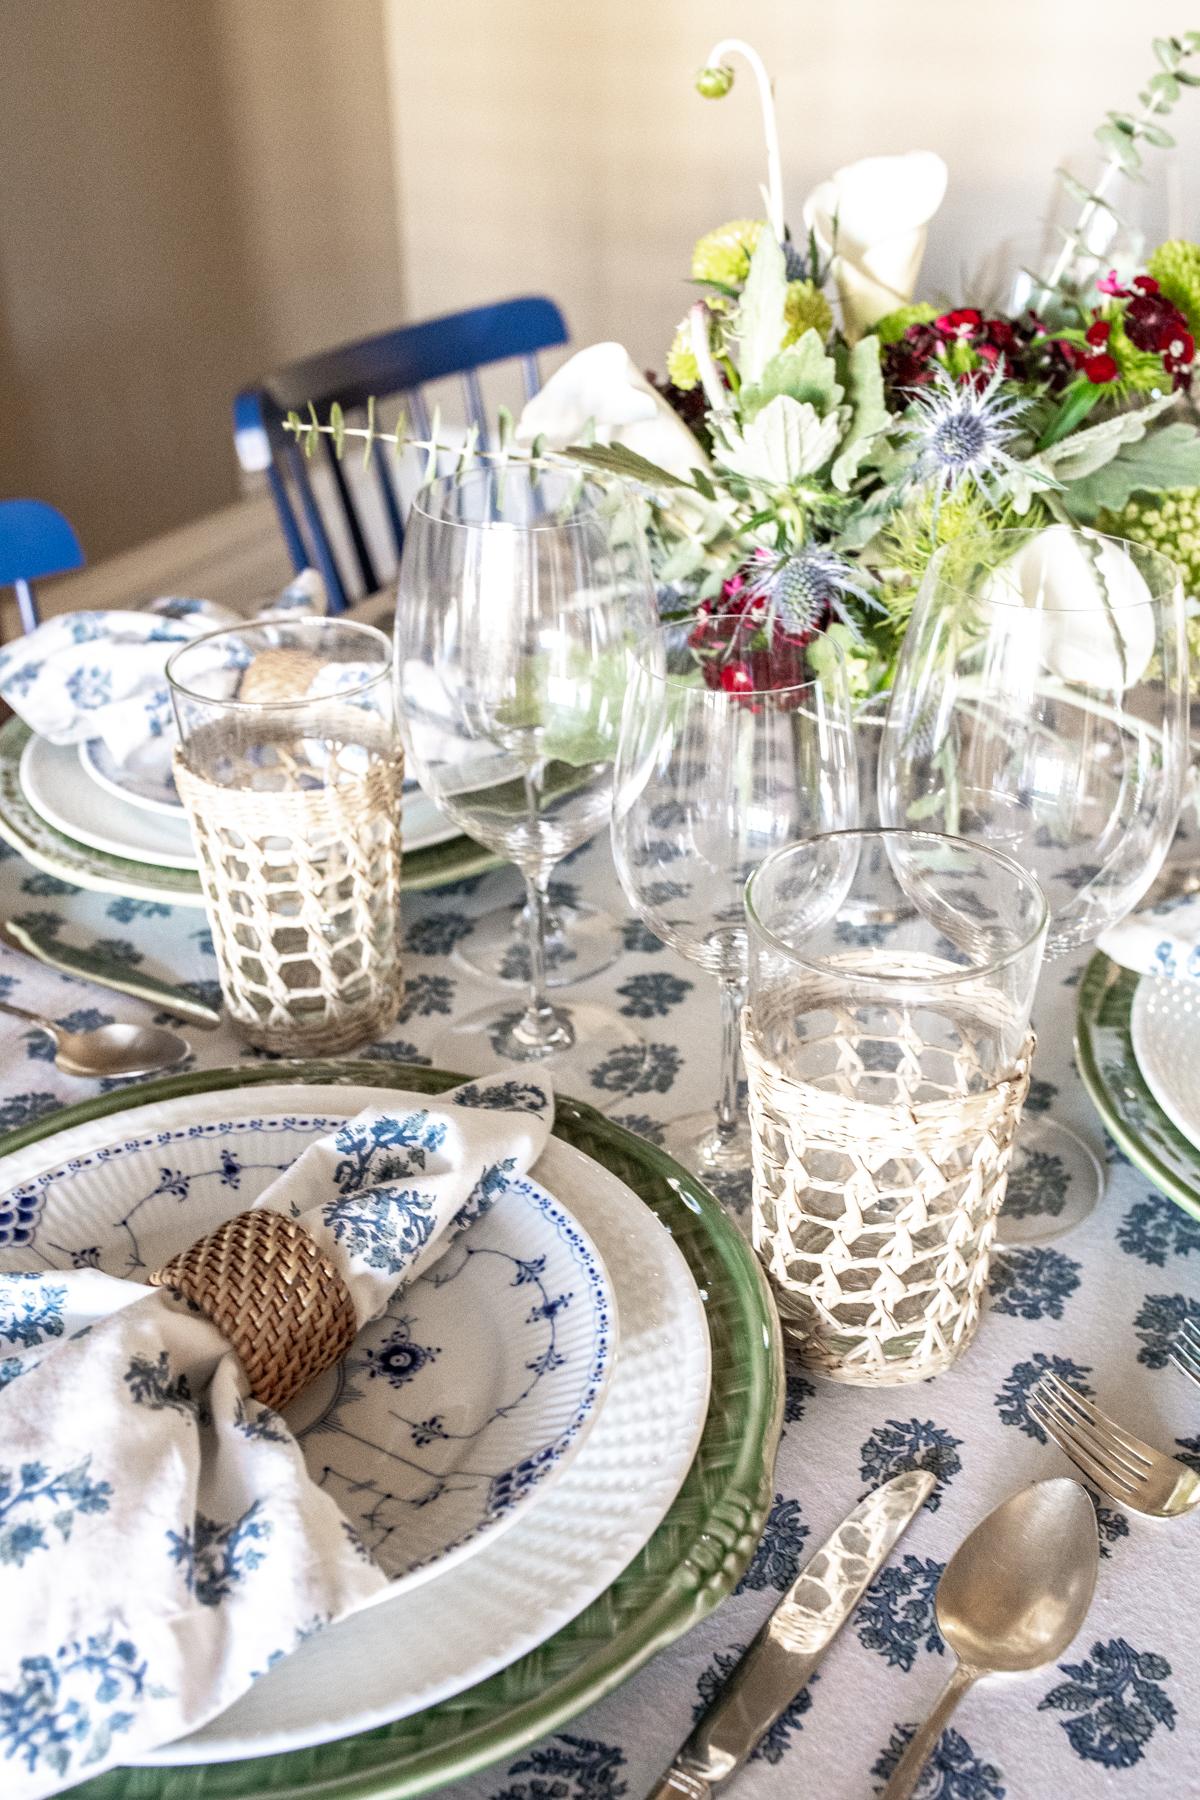 Spring Dinner Party Table x Pottery Barn  x Stacie Flinner-13.jpg